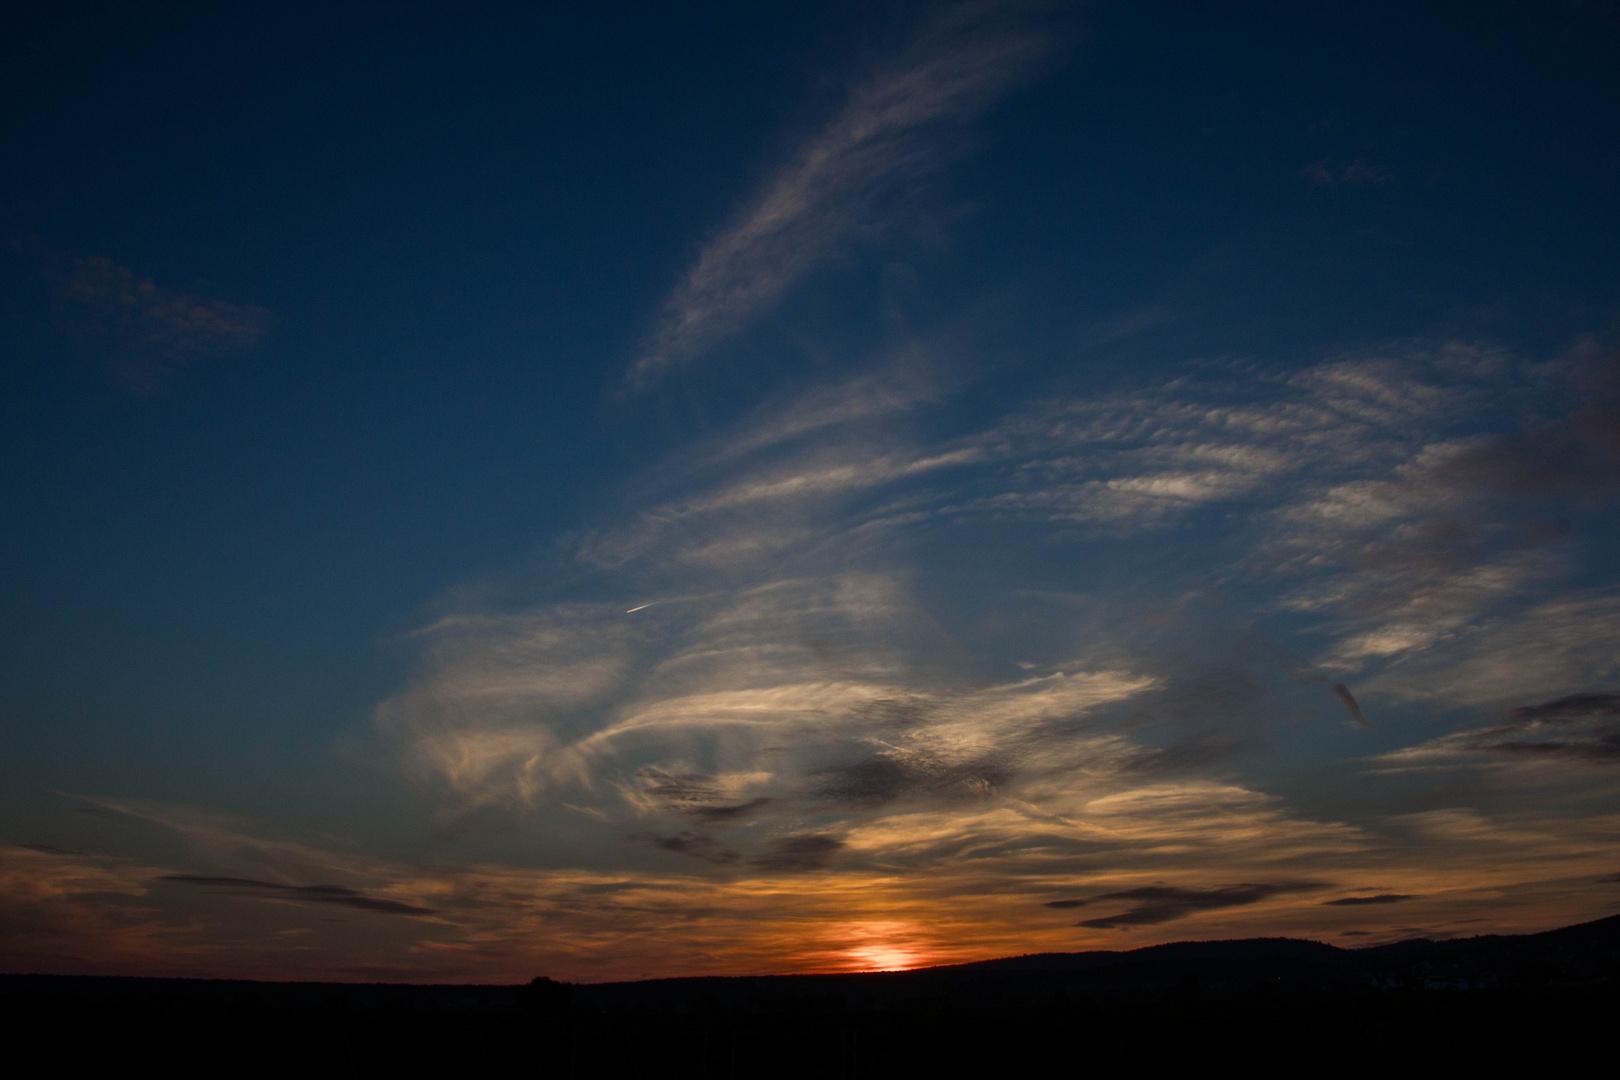 Sonnenuntergang über dem Leithagebirge